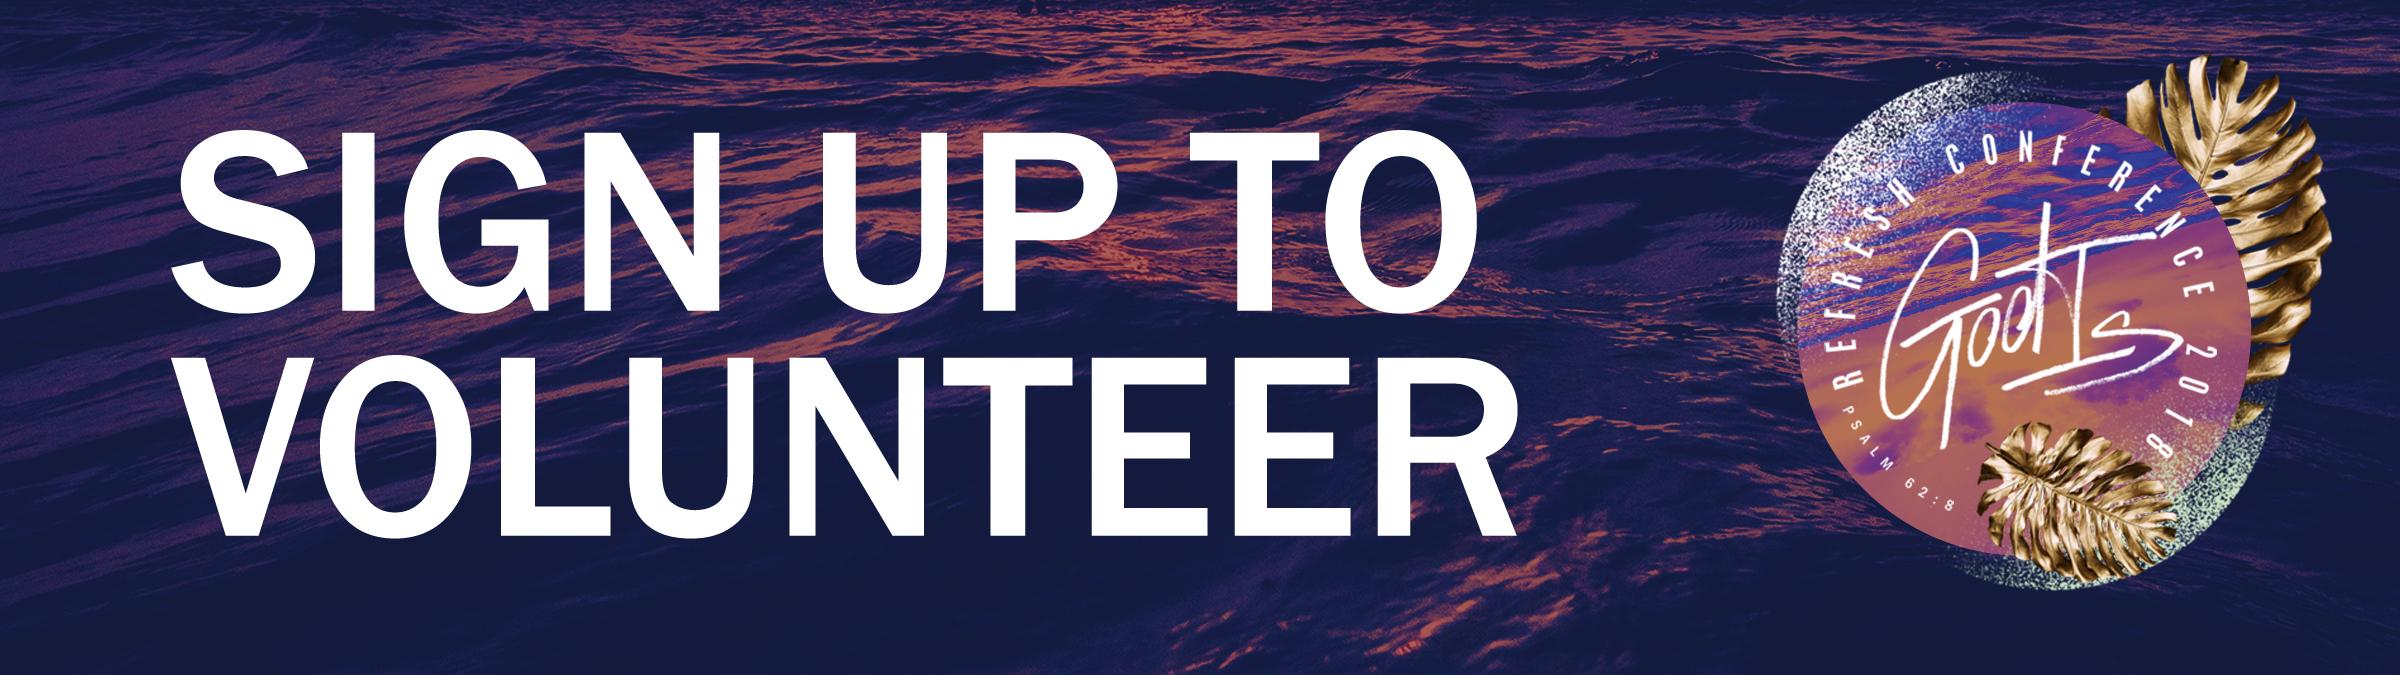 sign up to volunteer.jpg